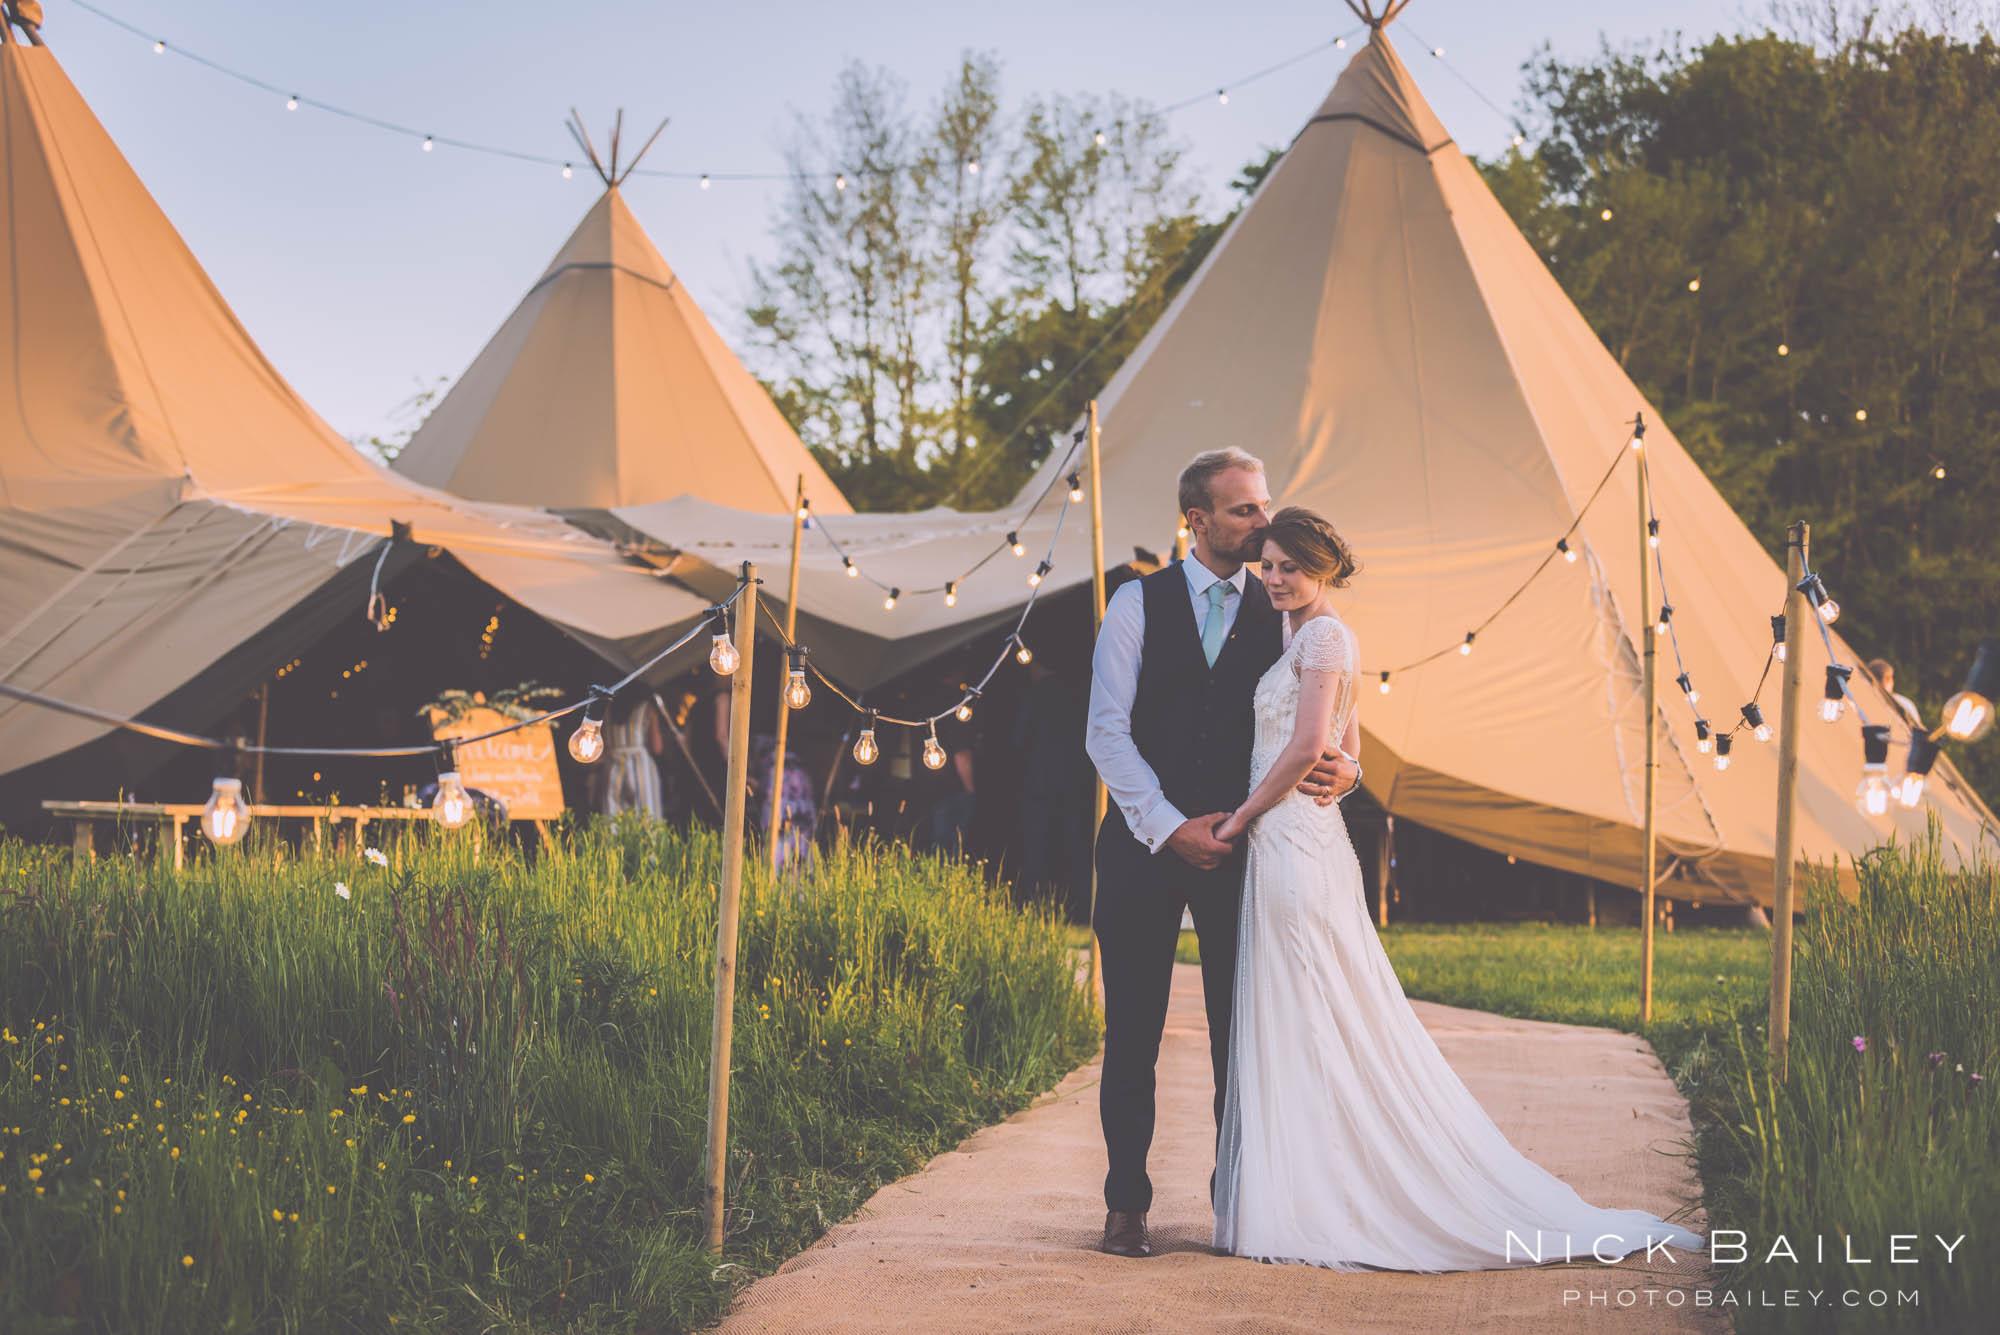 wedding-photographer-bodmin-106.jpg